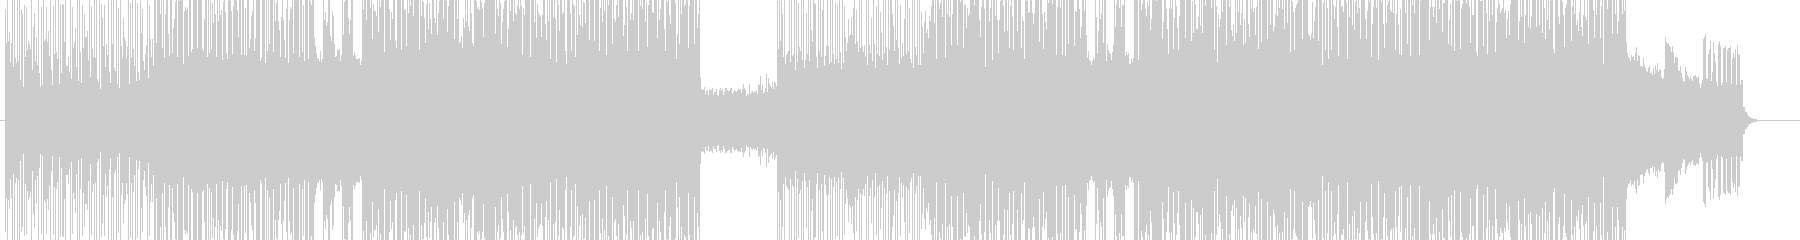 「HR/HM」「DARK」BGM193の未再生の波形